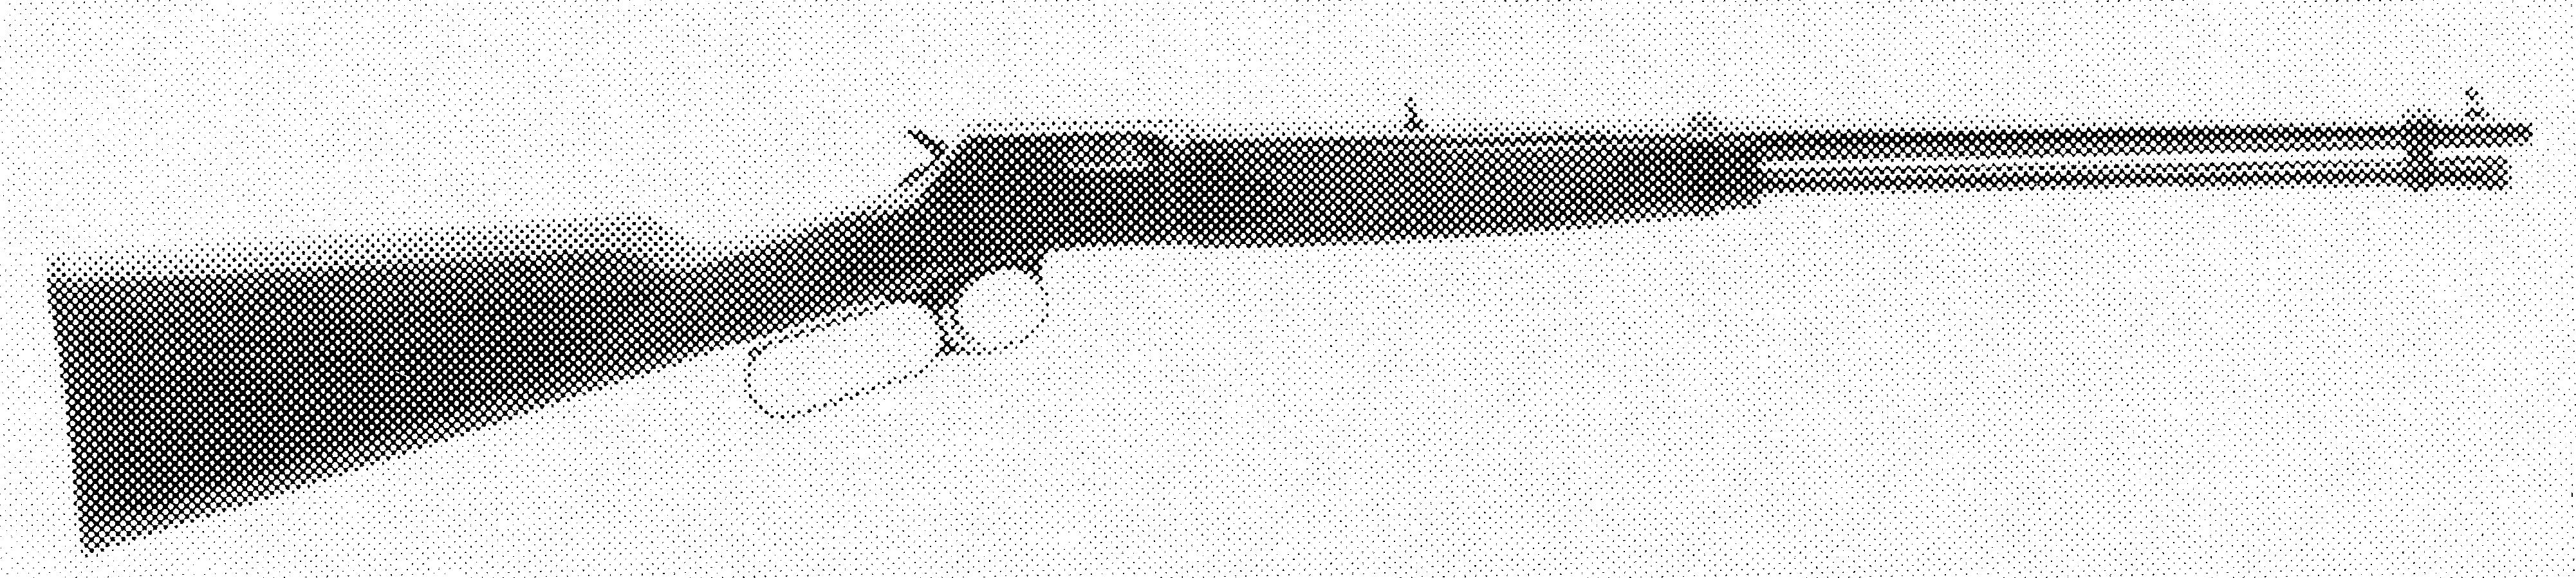 BL-22 Grade II